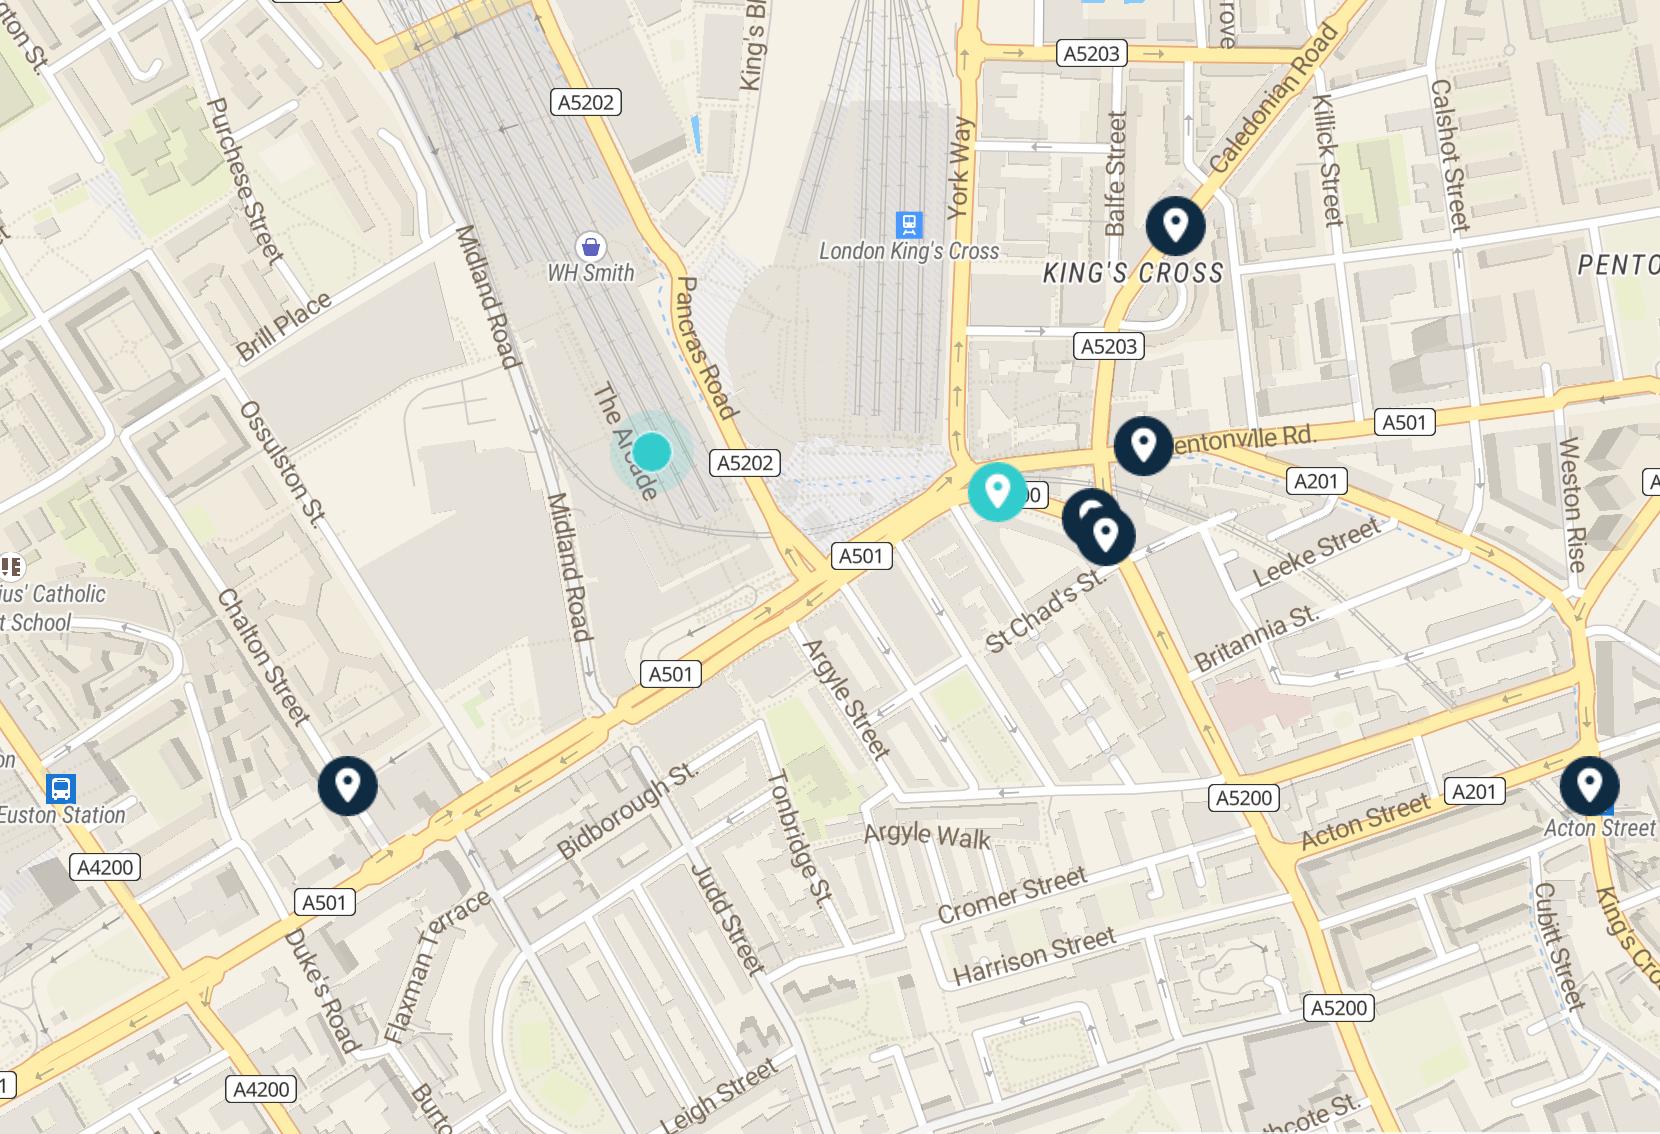 st pancras station map: luggage storage